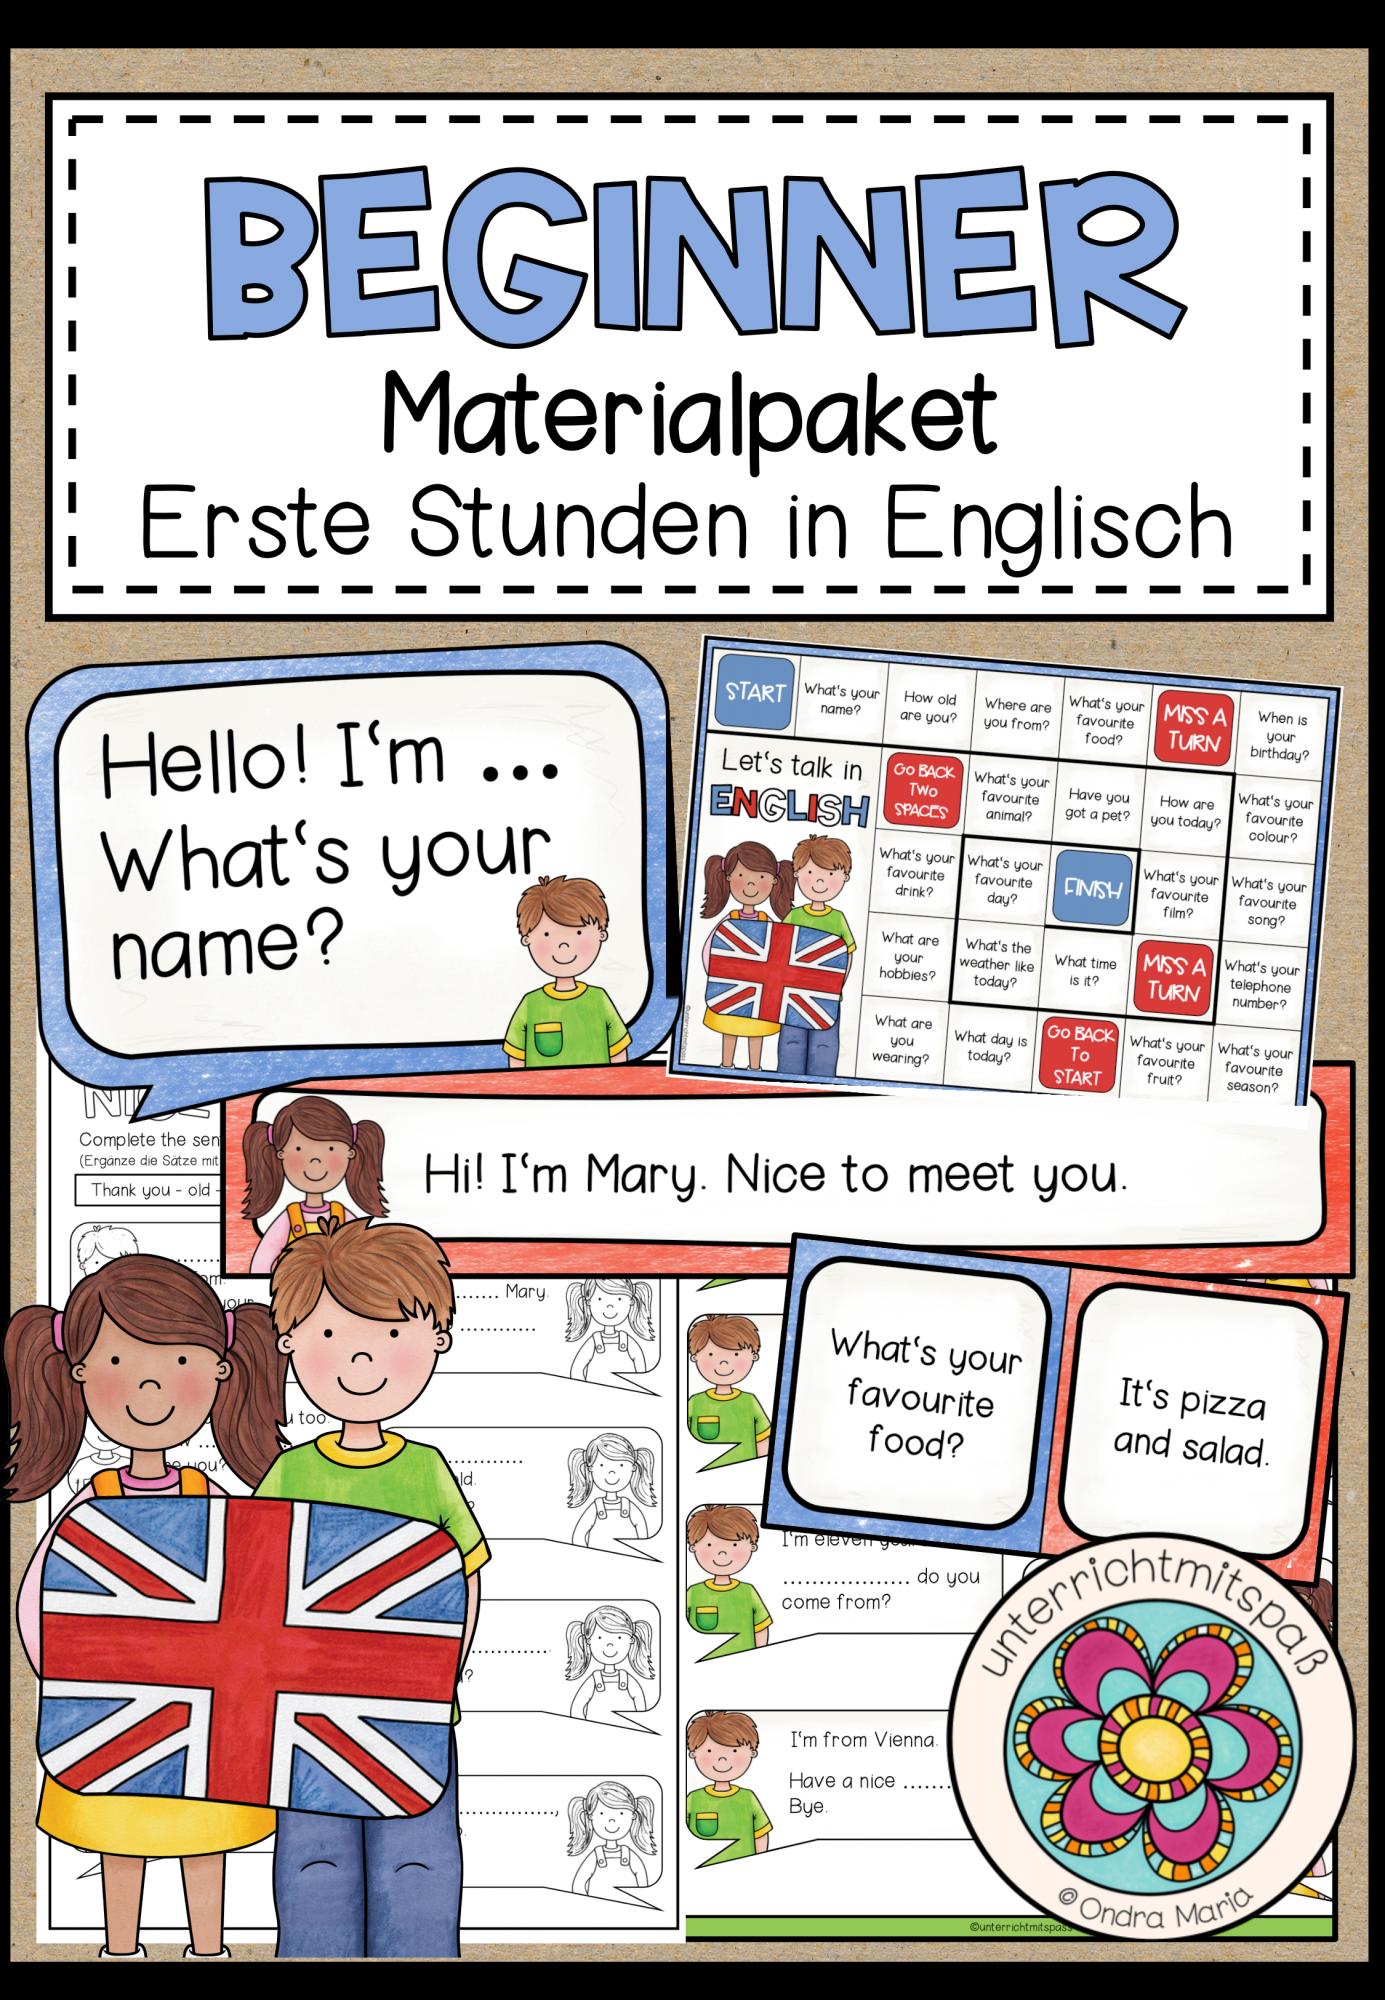 Nice To Meet You English For Beginners Materialpaket Unterrichtsmaterial Im Fach Englisch Englischunterricht Grundschule Grundschule Englisch Grundschule